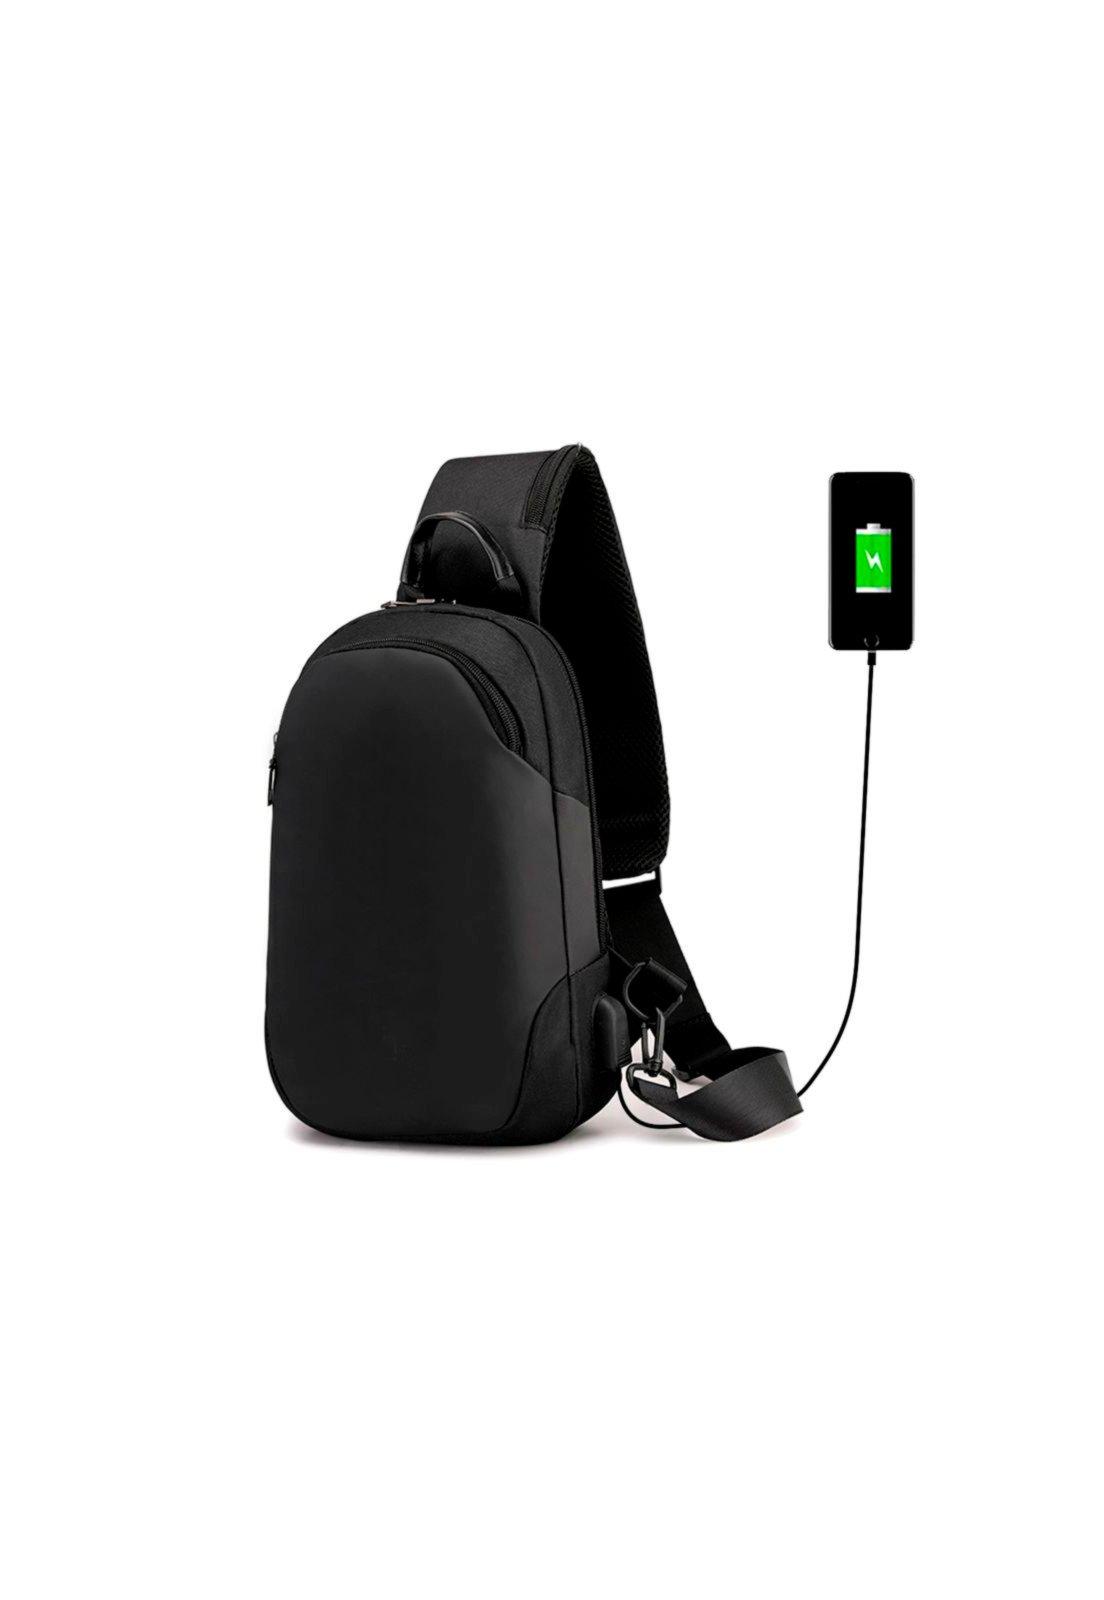 Mochila Bolsa Mala Anti Furto Cross Body USB Tablet Notebook Preta - Compre Agora